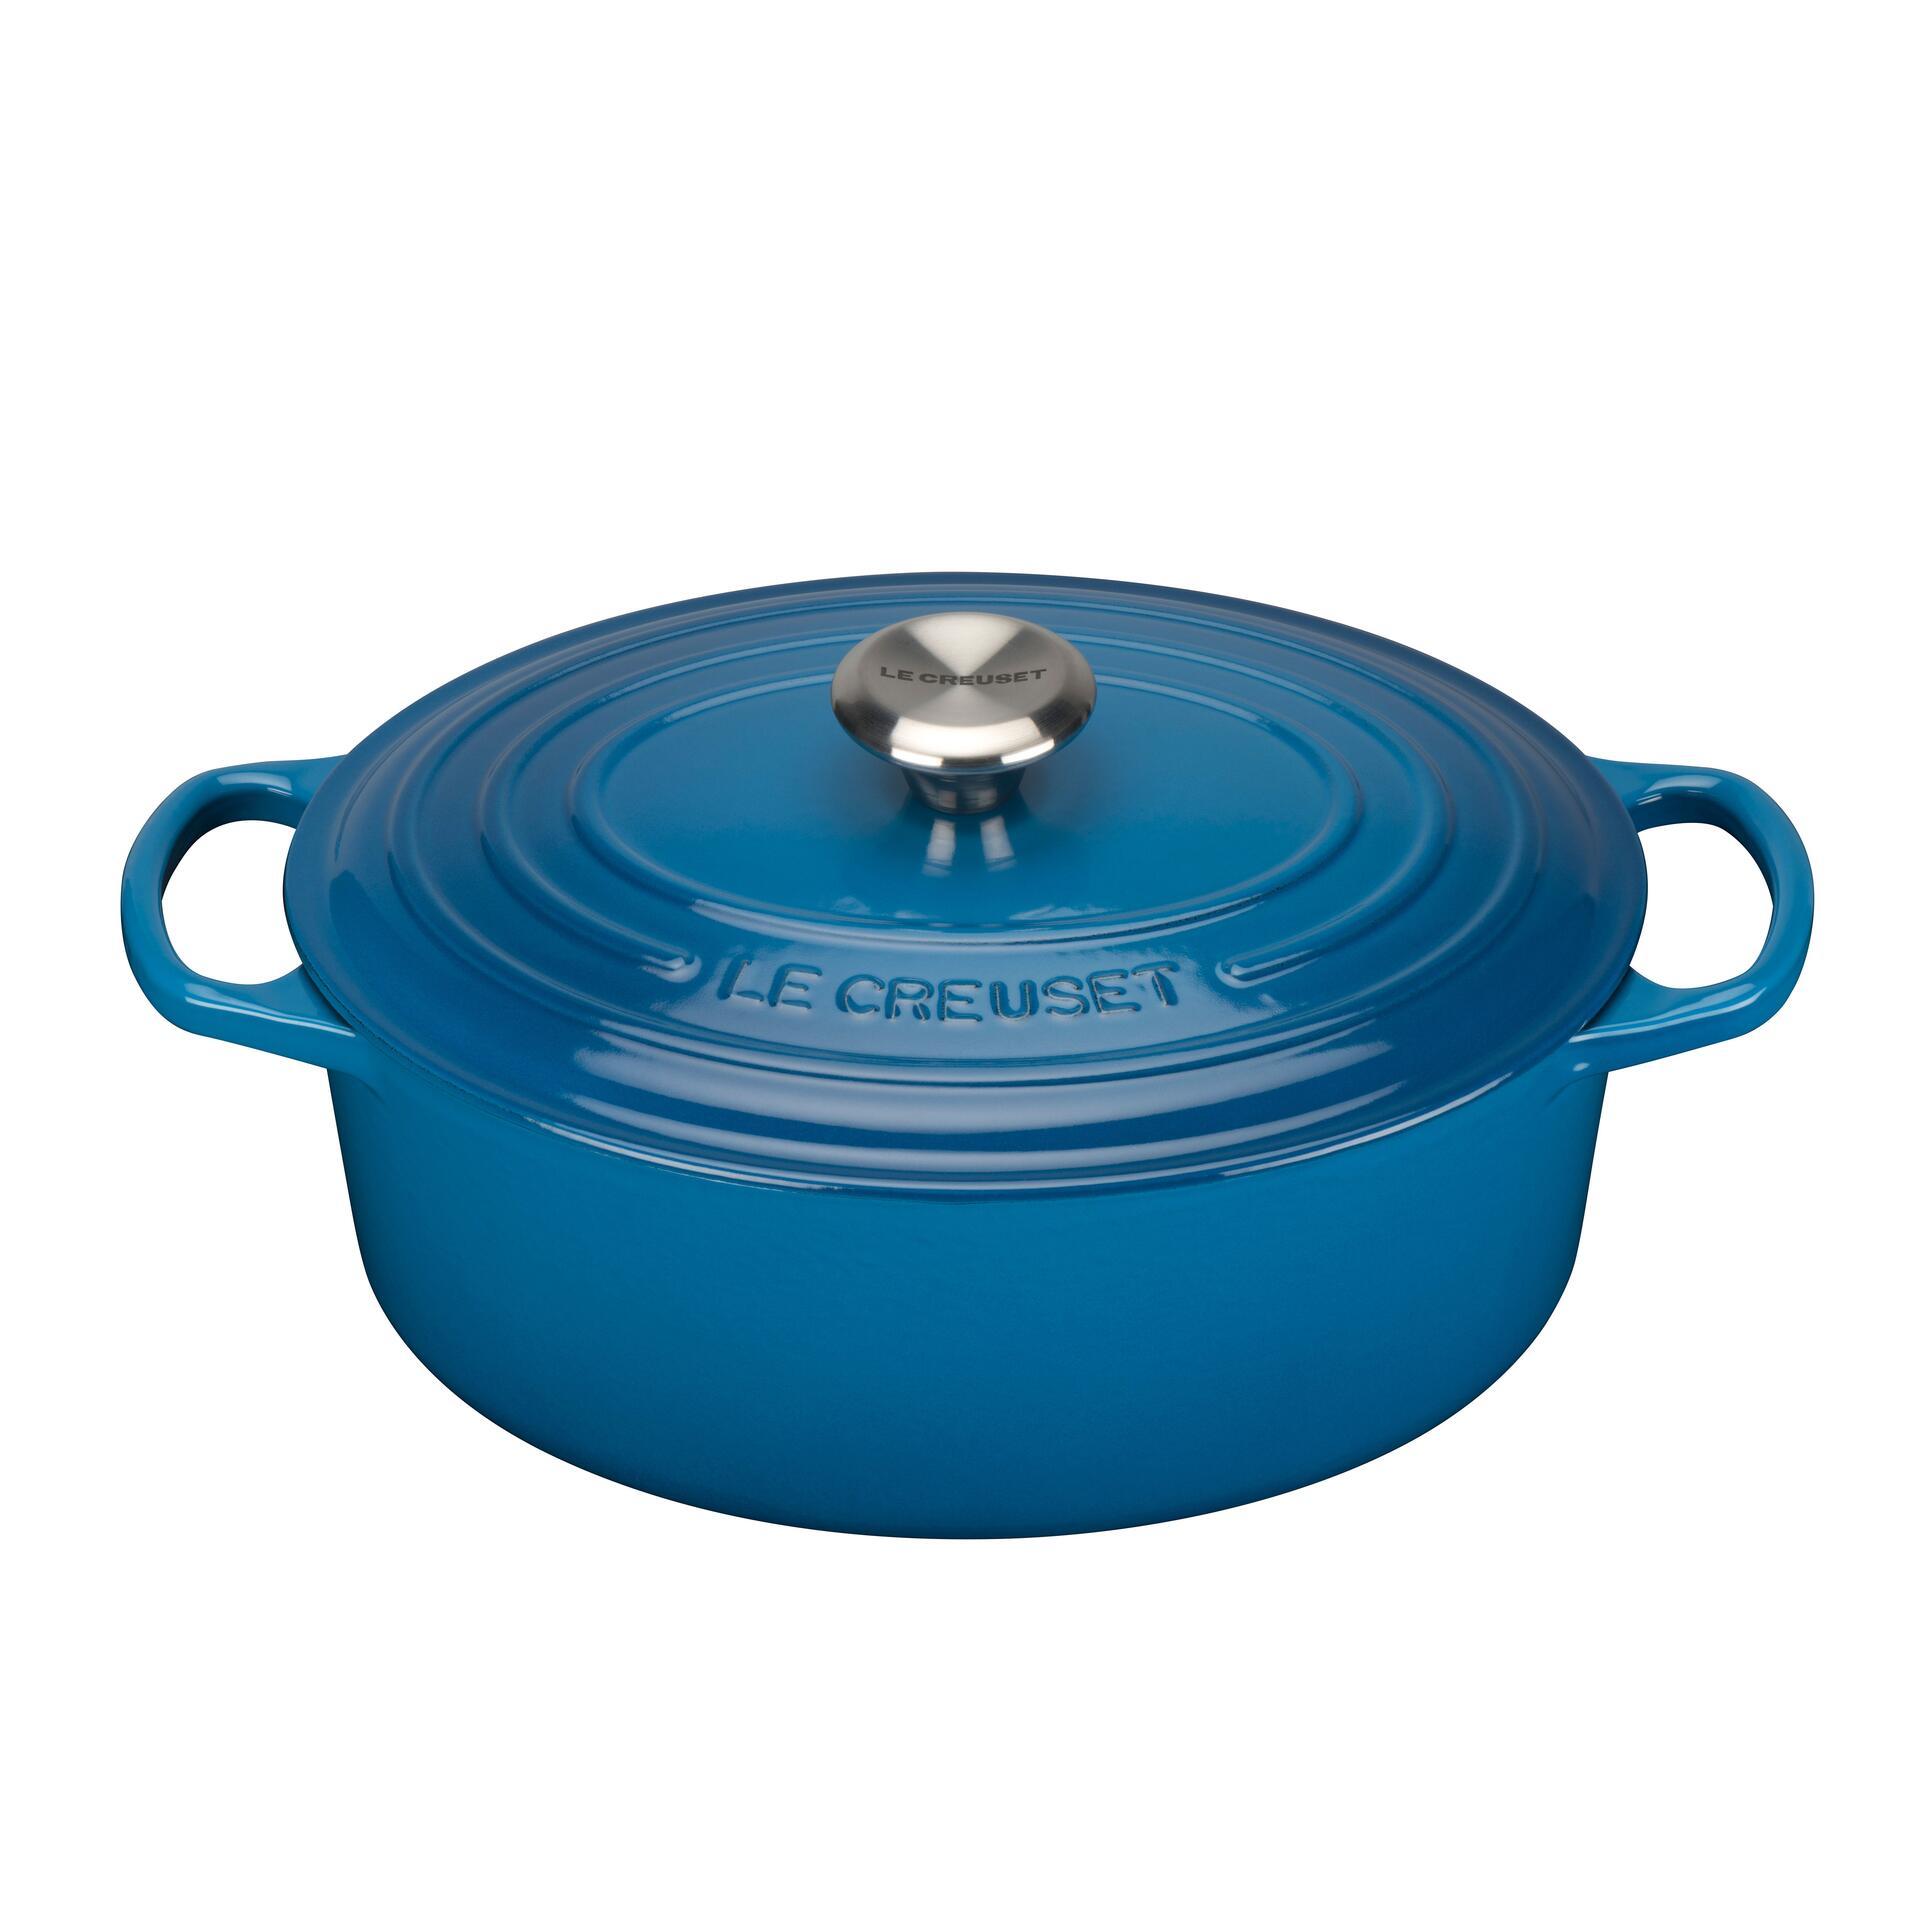 Le Creuset Bräter Signature 29 cm oval Marseille Blau 4,7 L